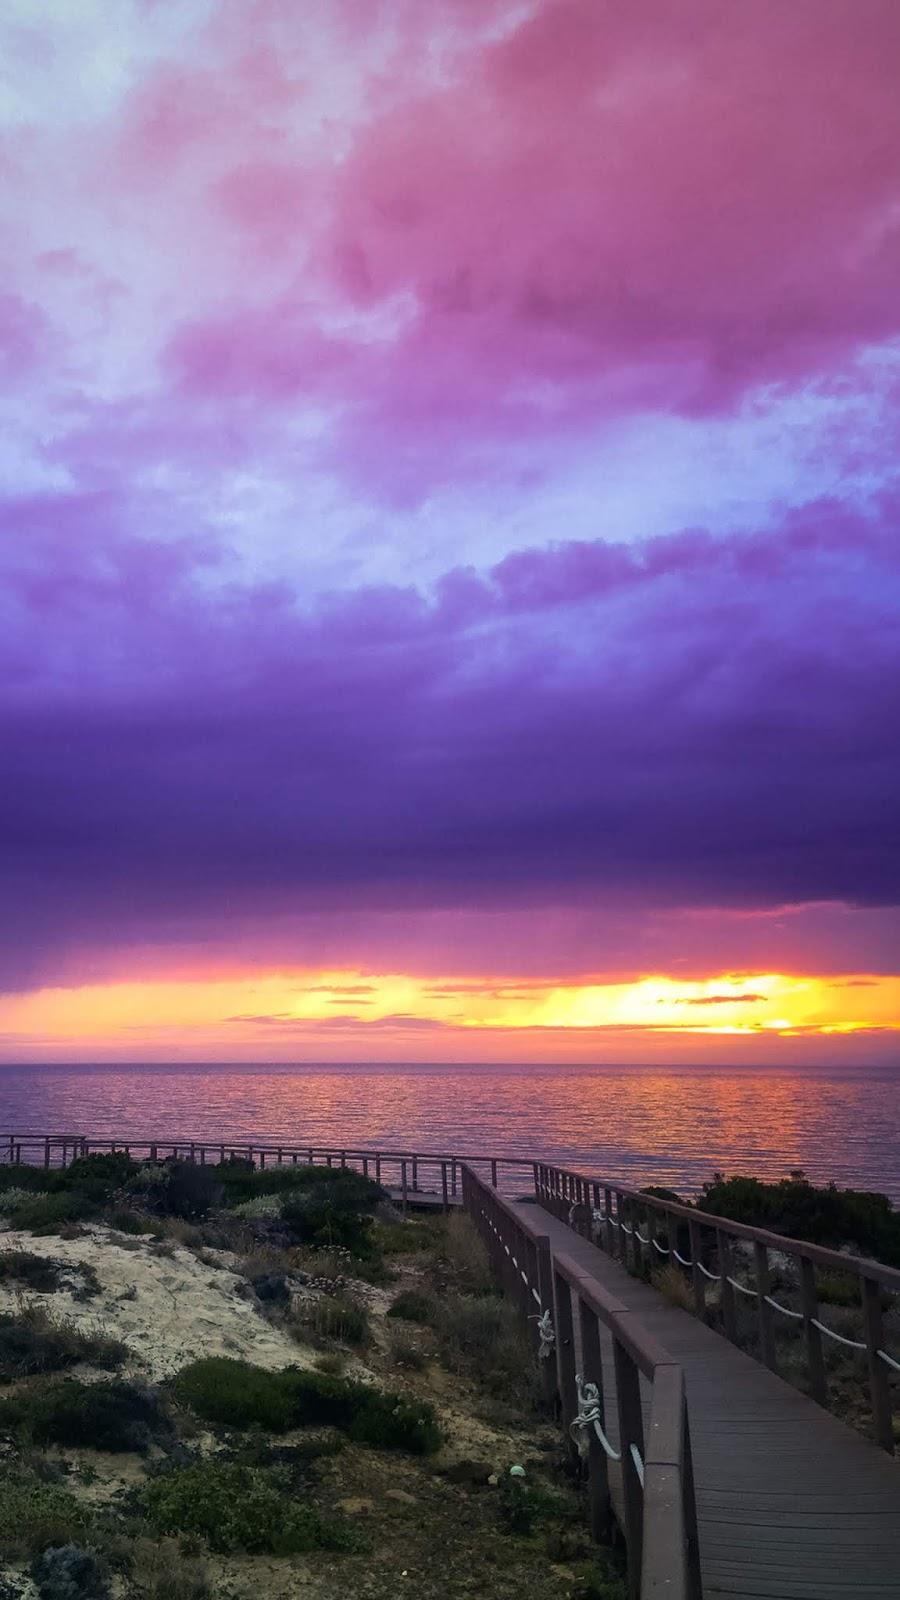 Twilight sky in the sunset